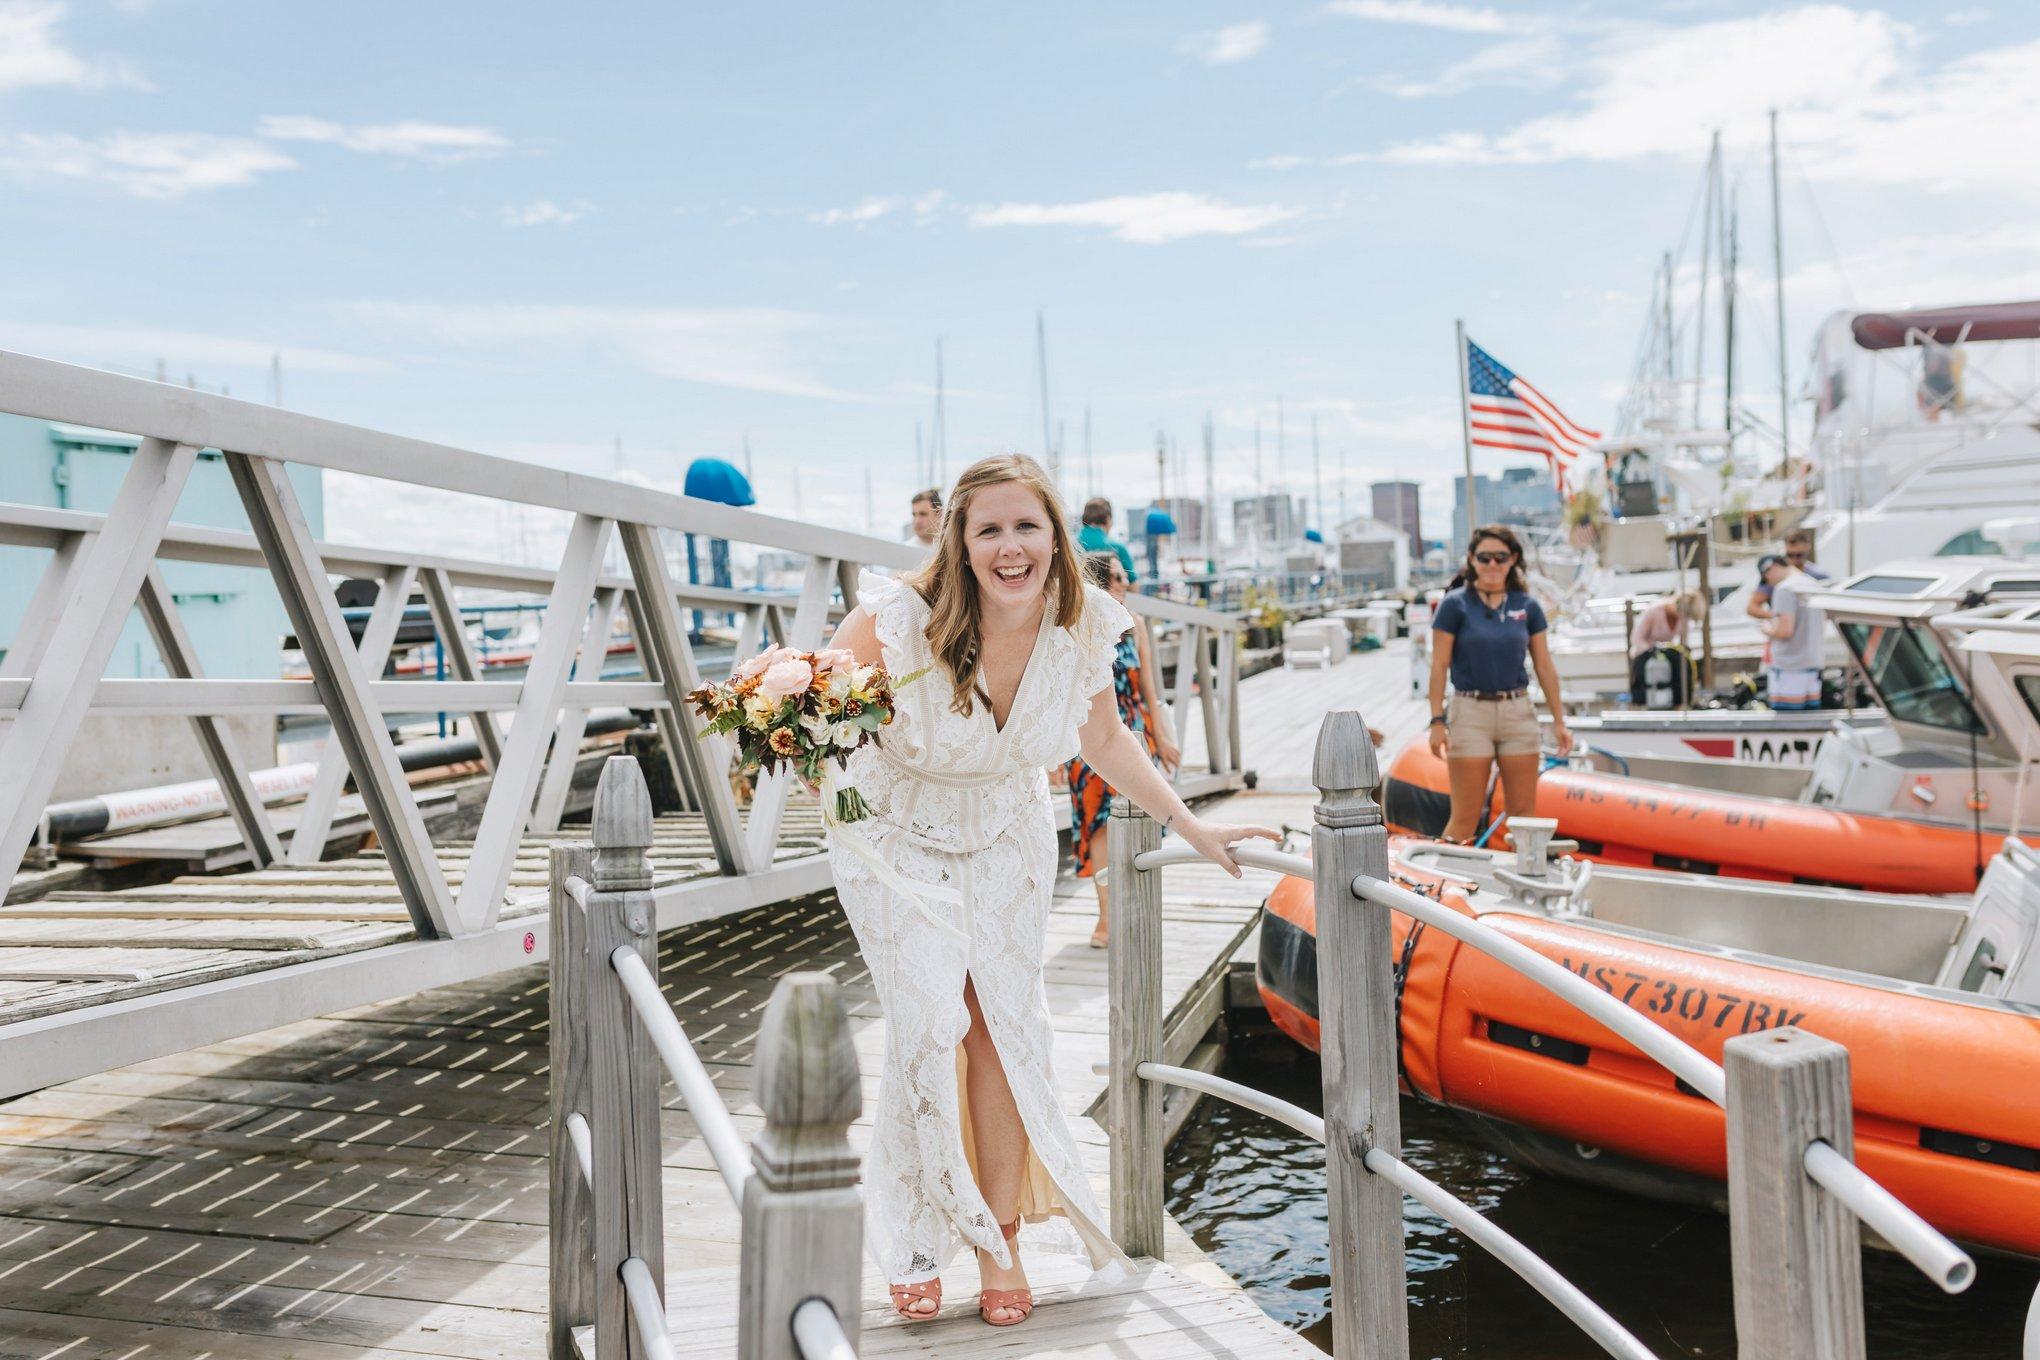 Barking-Crab-Seaport-East-Boston-Eastie-Wedding-10.jpg